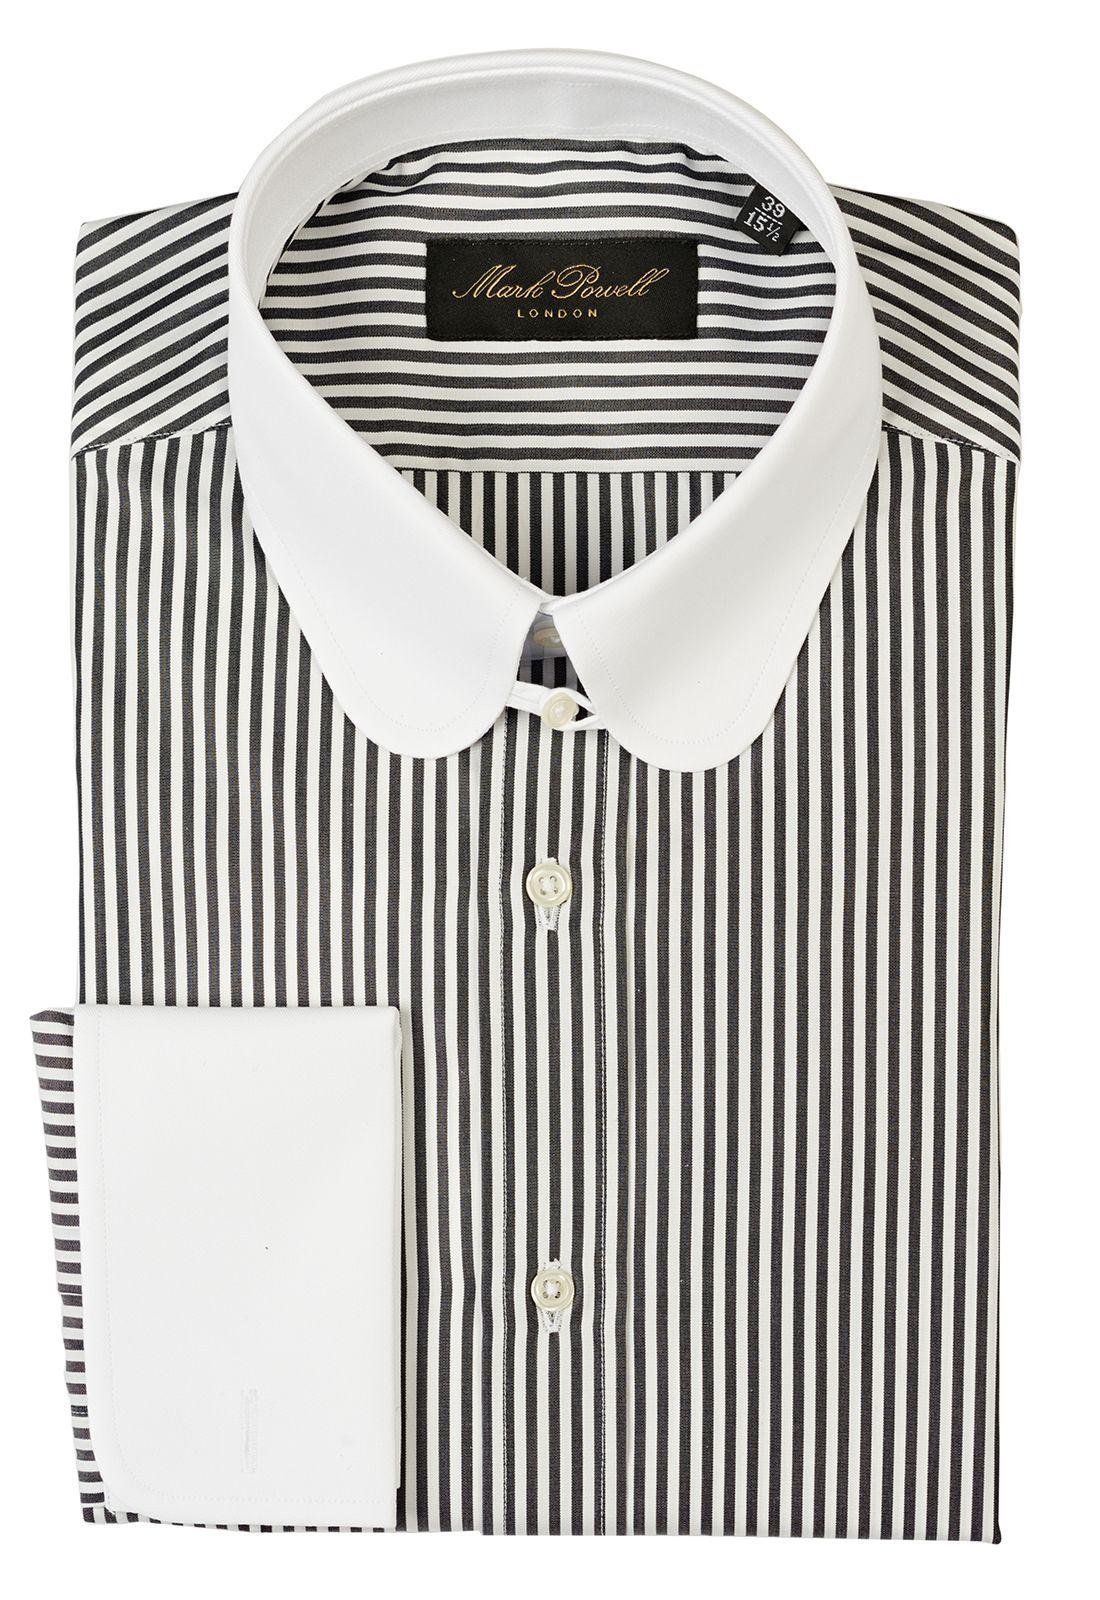 Round Tab Collar Shirt Stripe Black White Mens Shirt Dress Club Collar Dress Shirt Shirt Collar Styles [ 1600 x 1100 Pixel ]